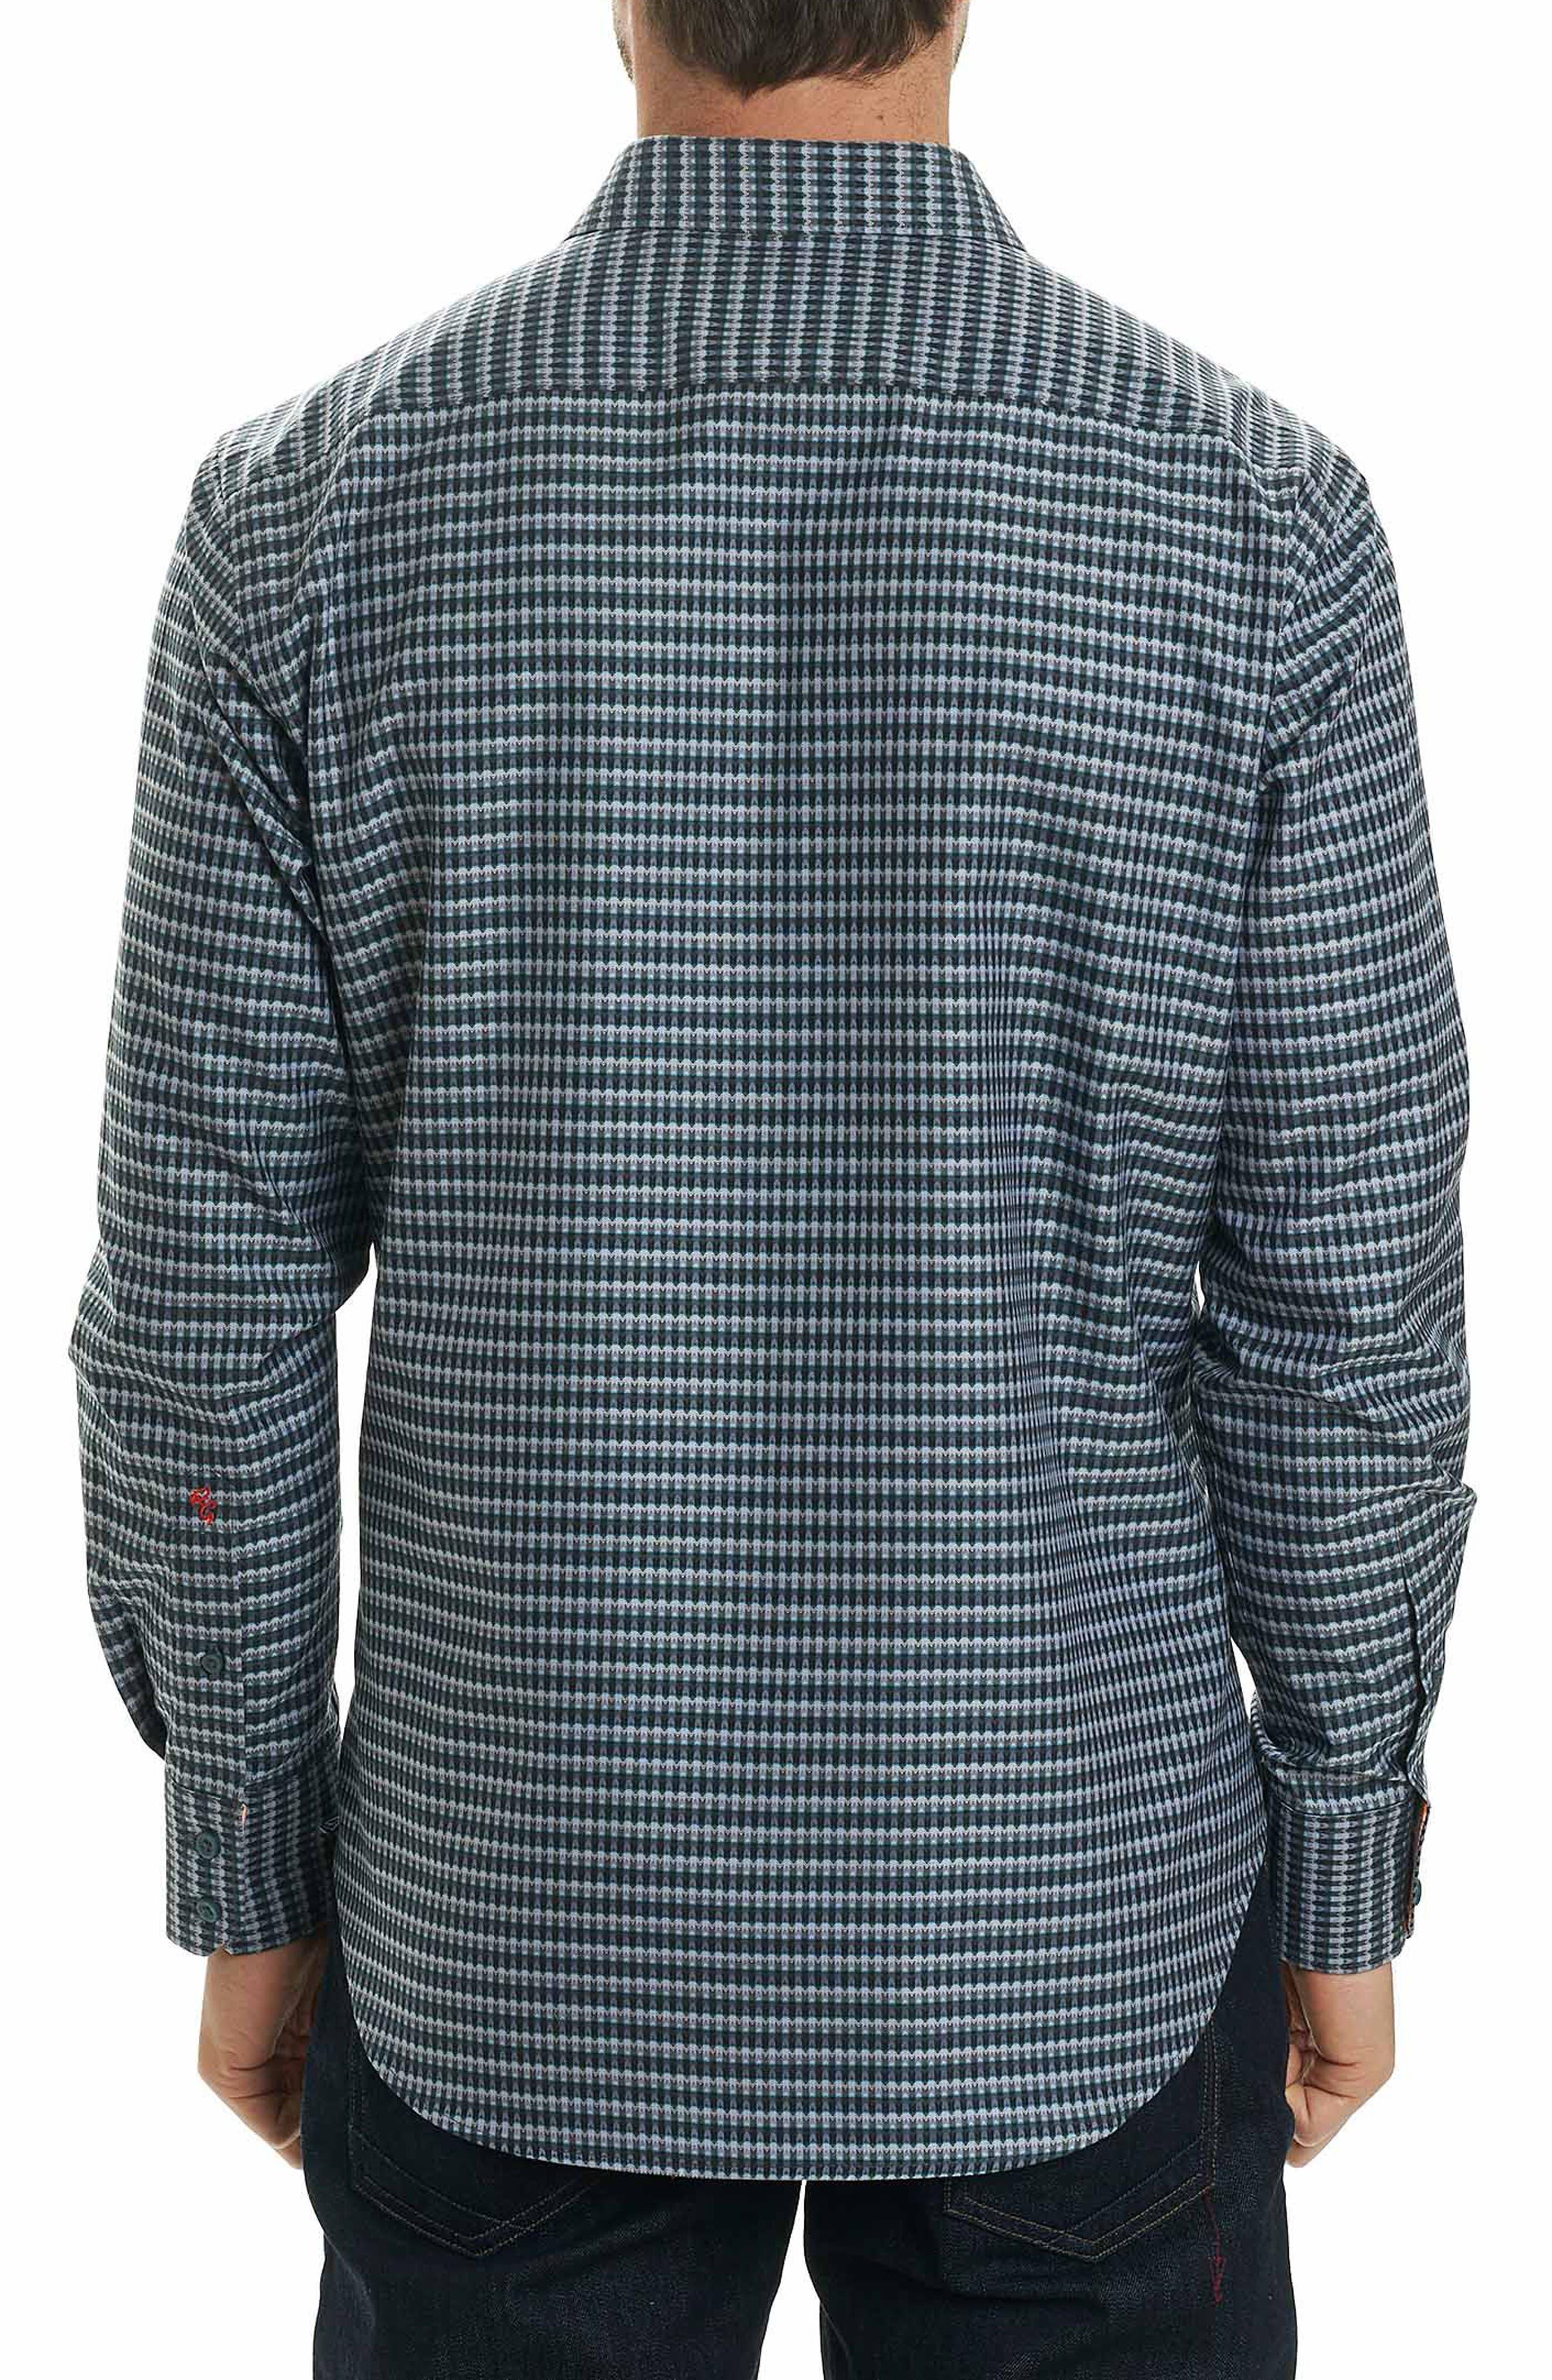 Hill Punch Classic Fit Print Sport Shirt,                             Alternate thumbnail 2, color,                             063